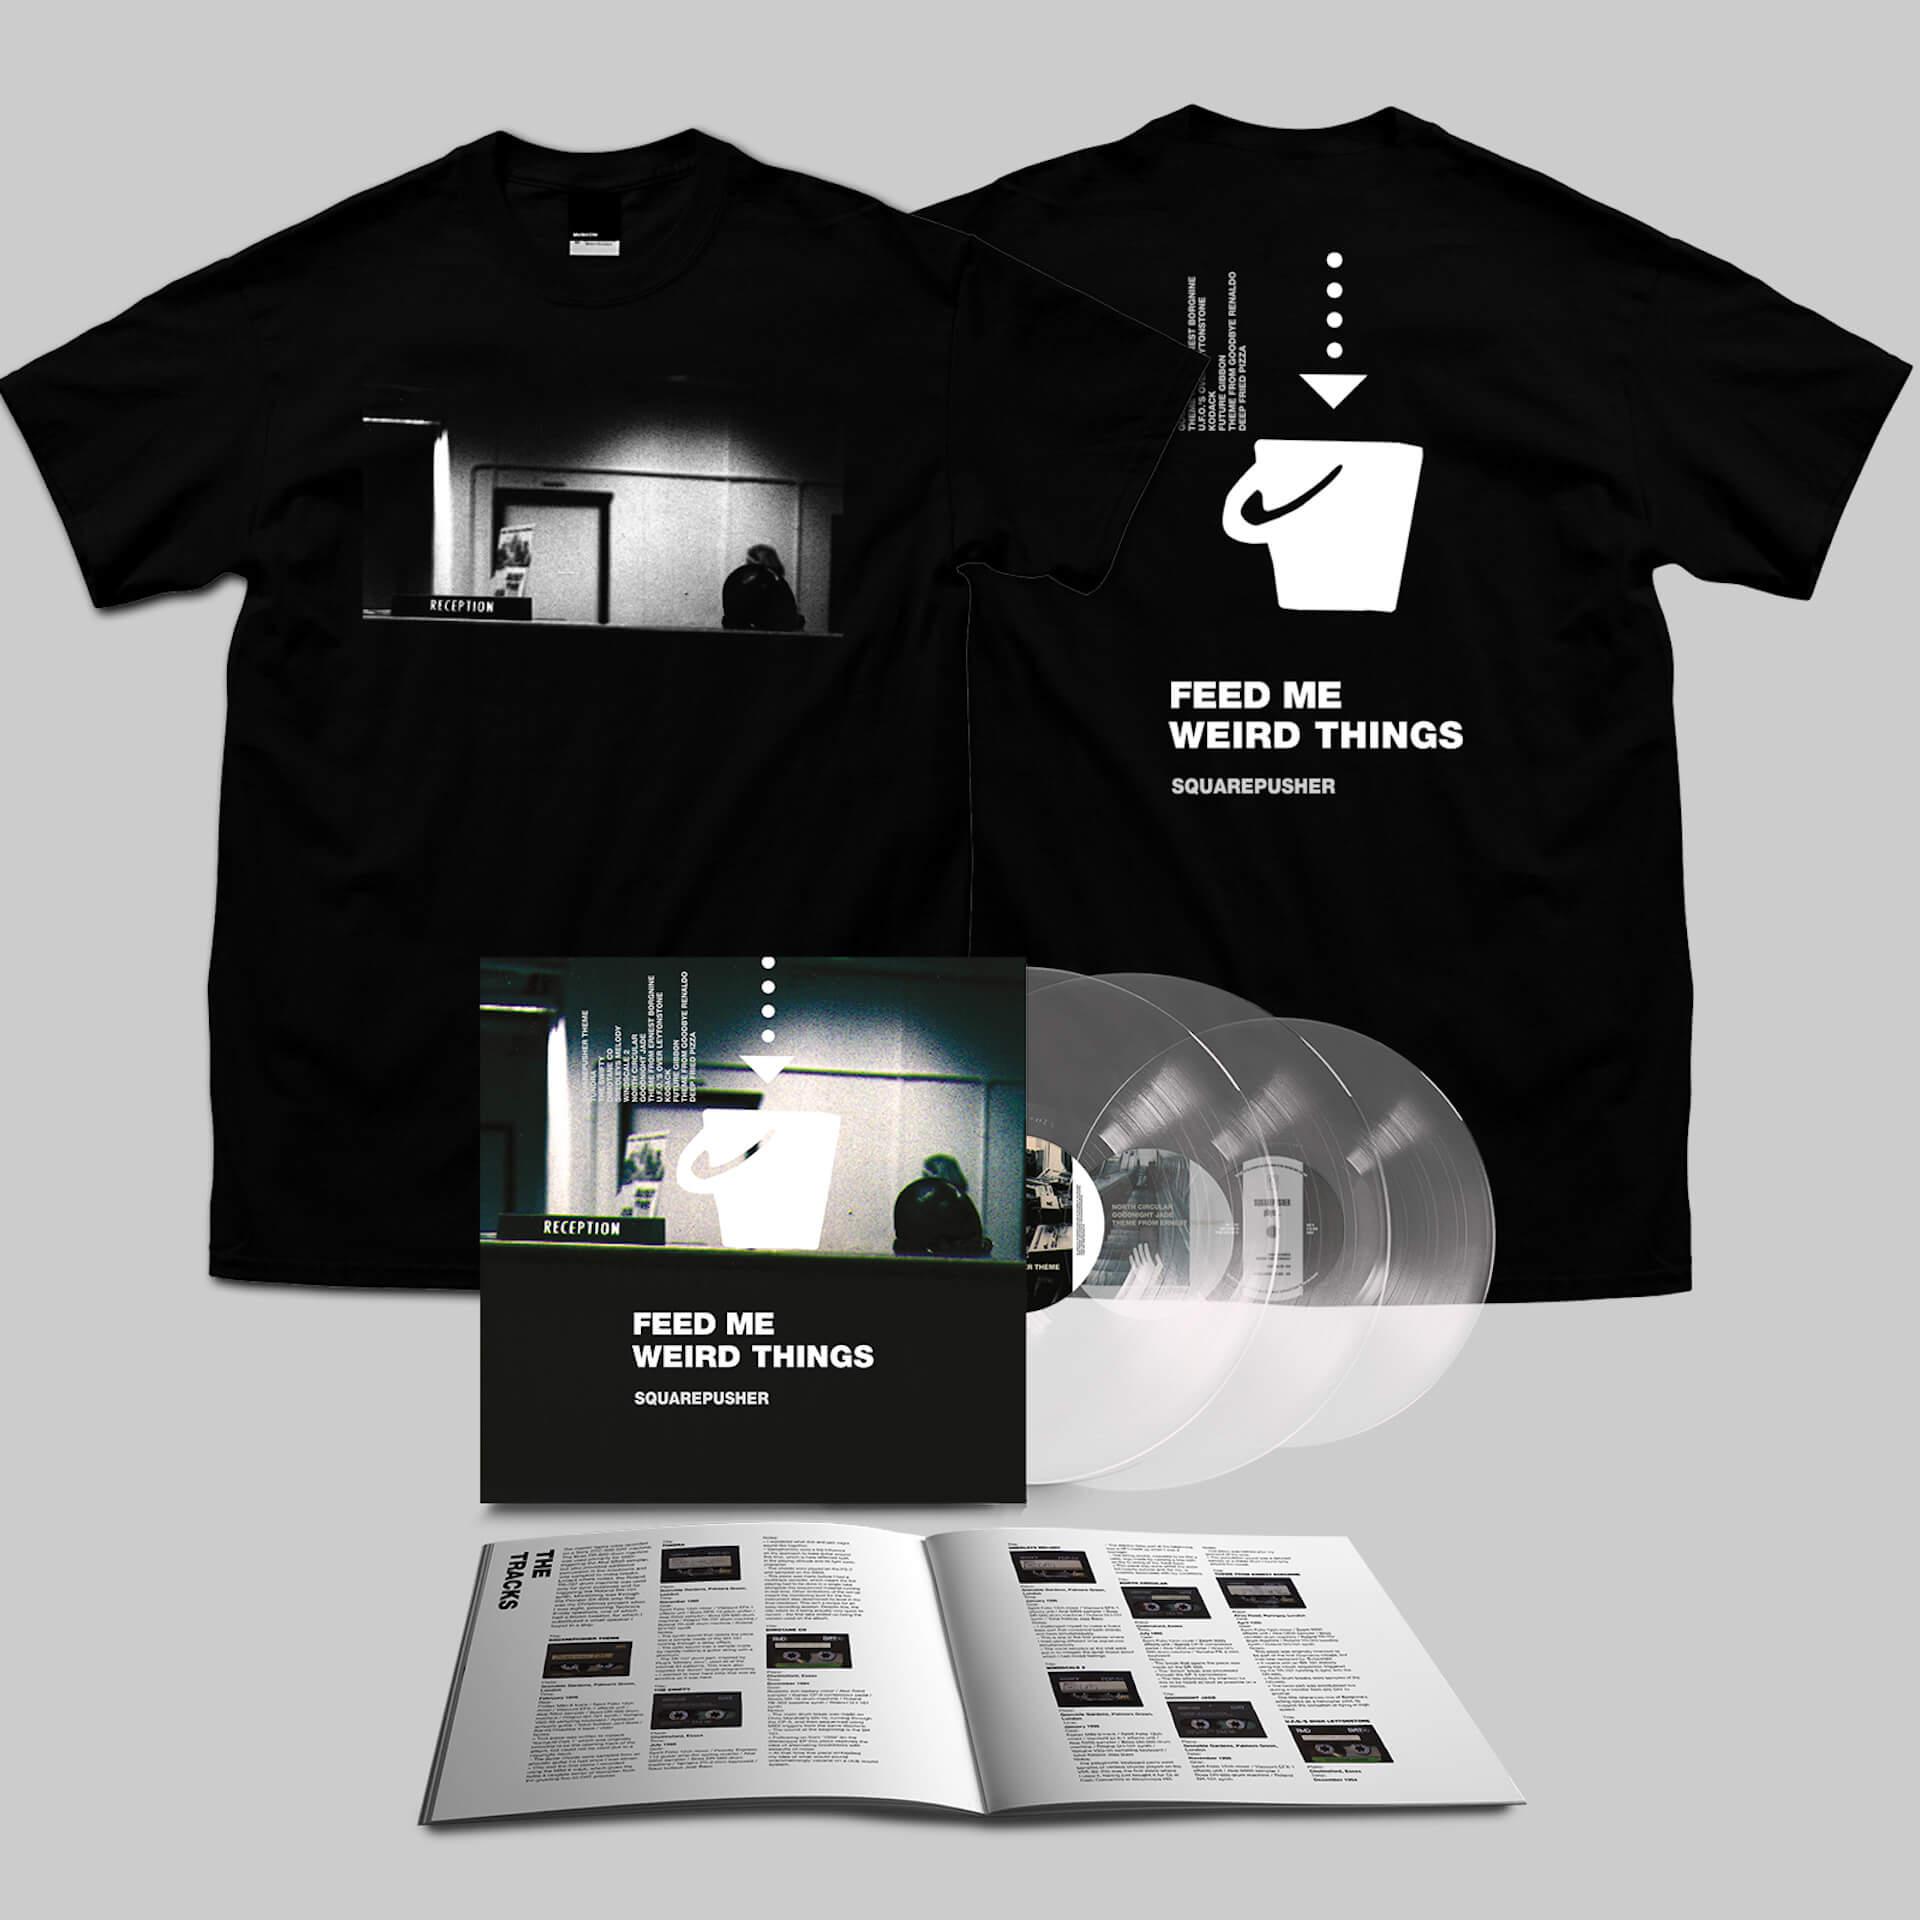 Squarepusherデビューアルバム『Feed Me Weird Things』再発盤が本日ついに発売!待望のサブスクも解禁 music210604_squarepusher_8